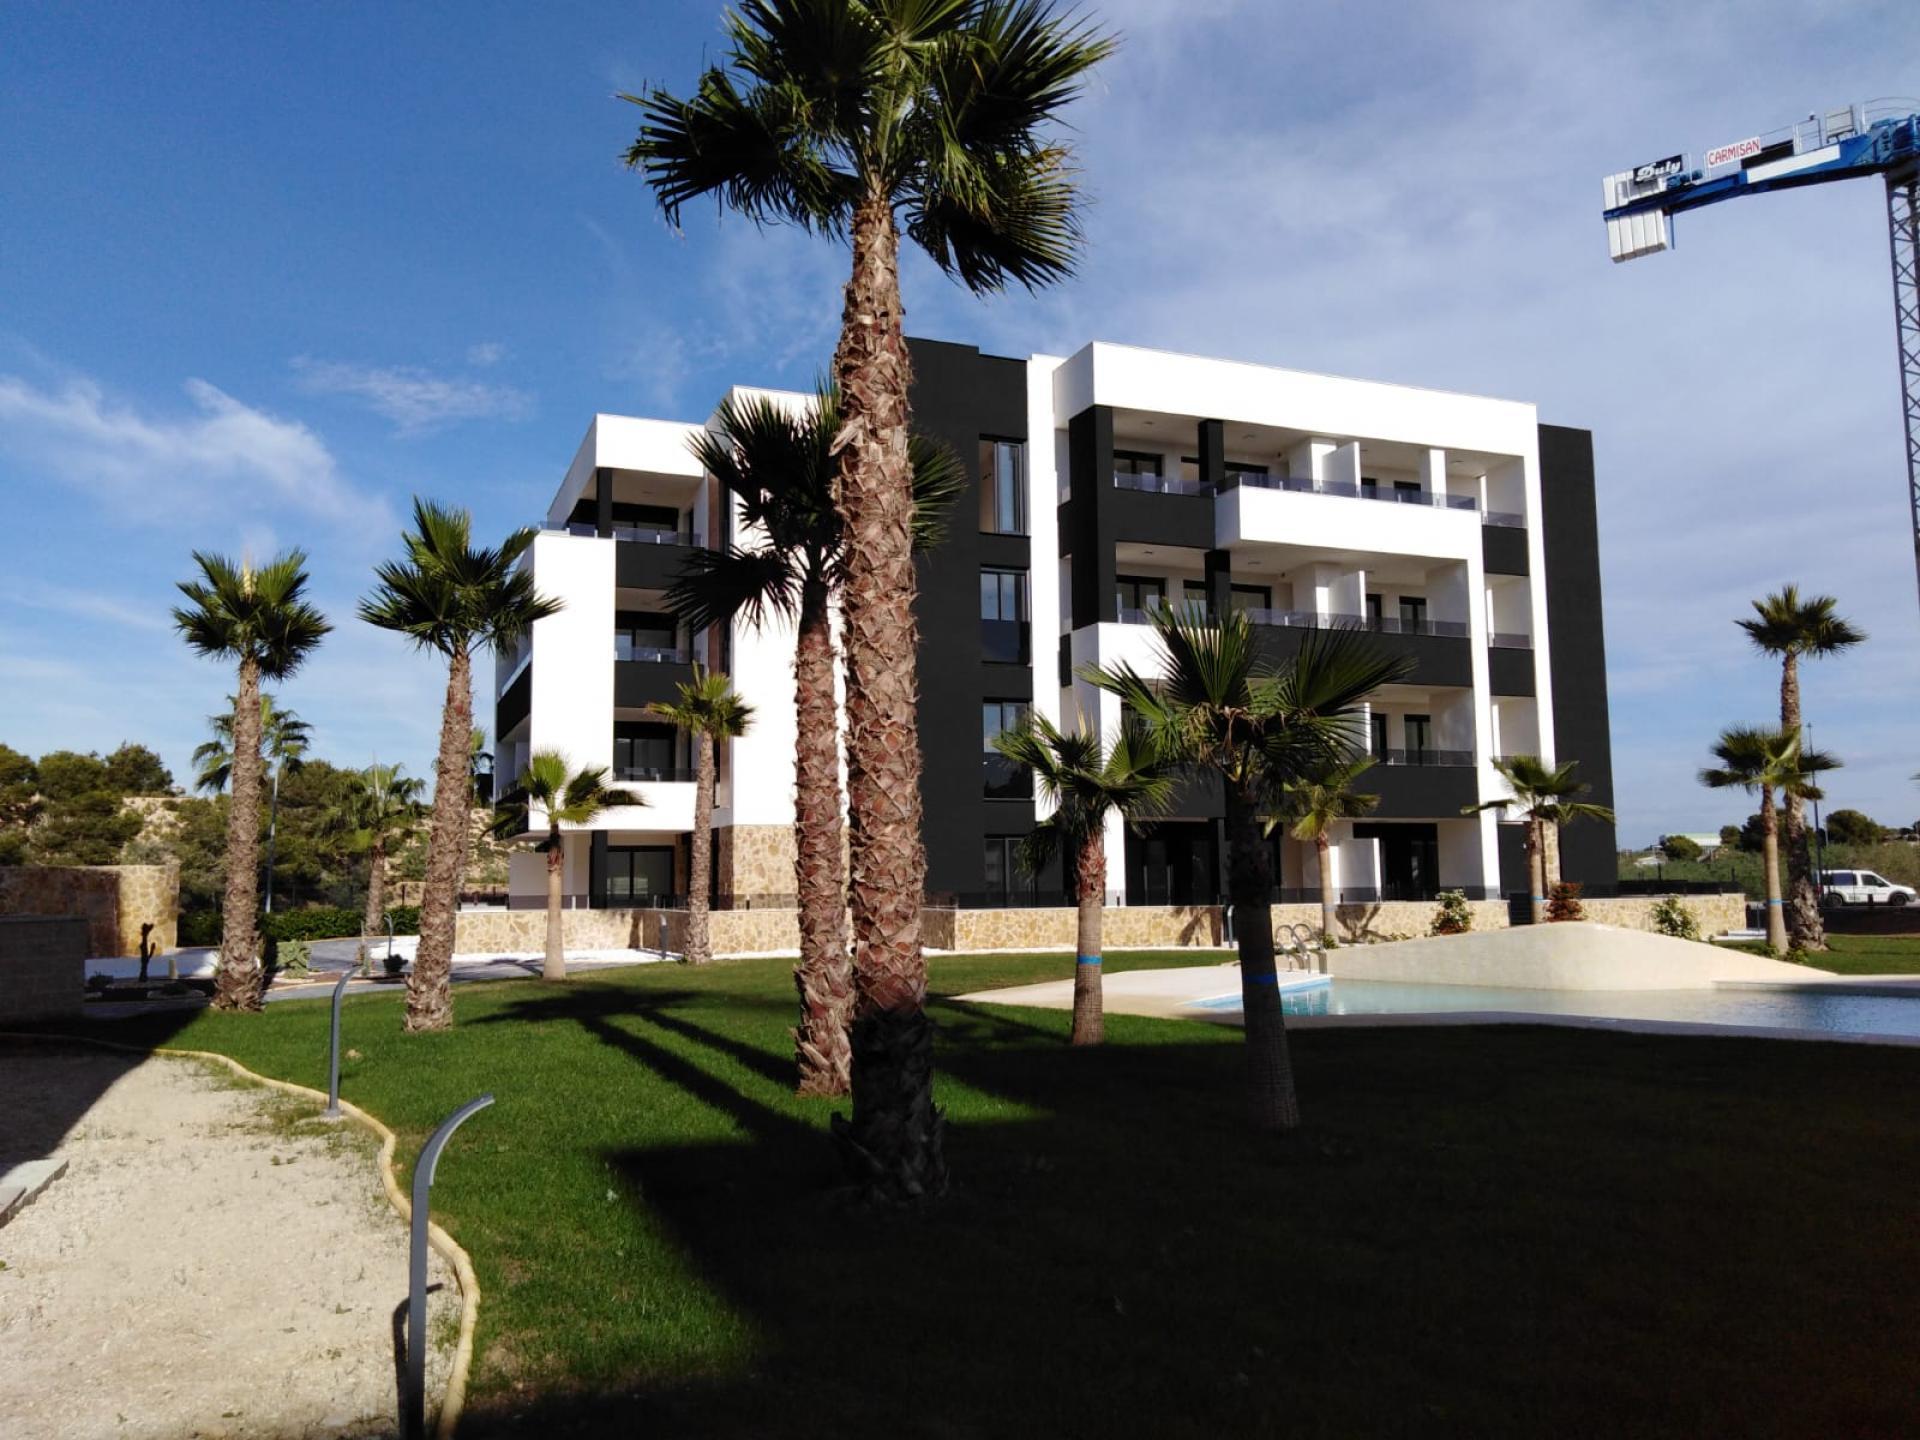 Amanecer - Orihuela-Costa, Spanje